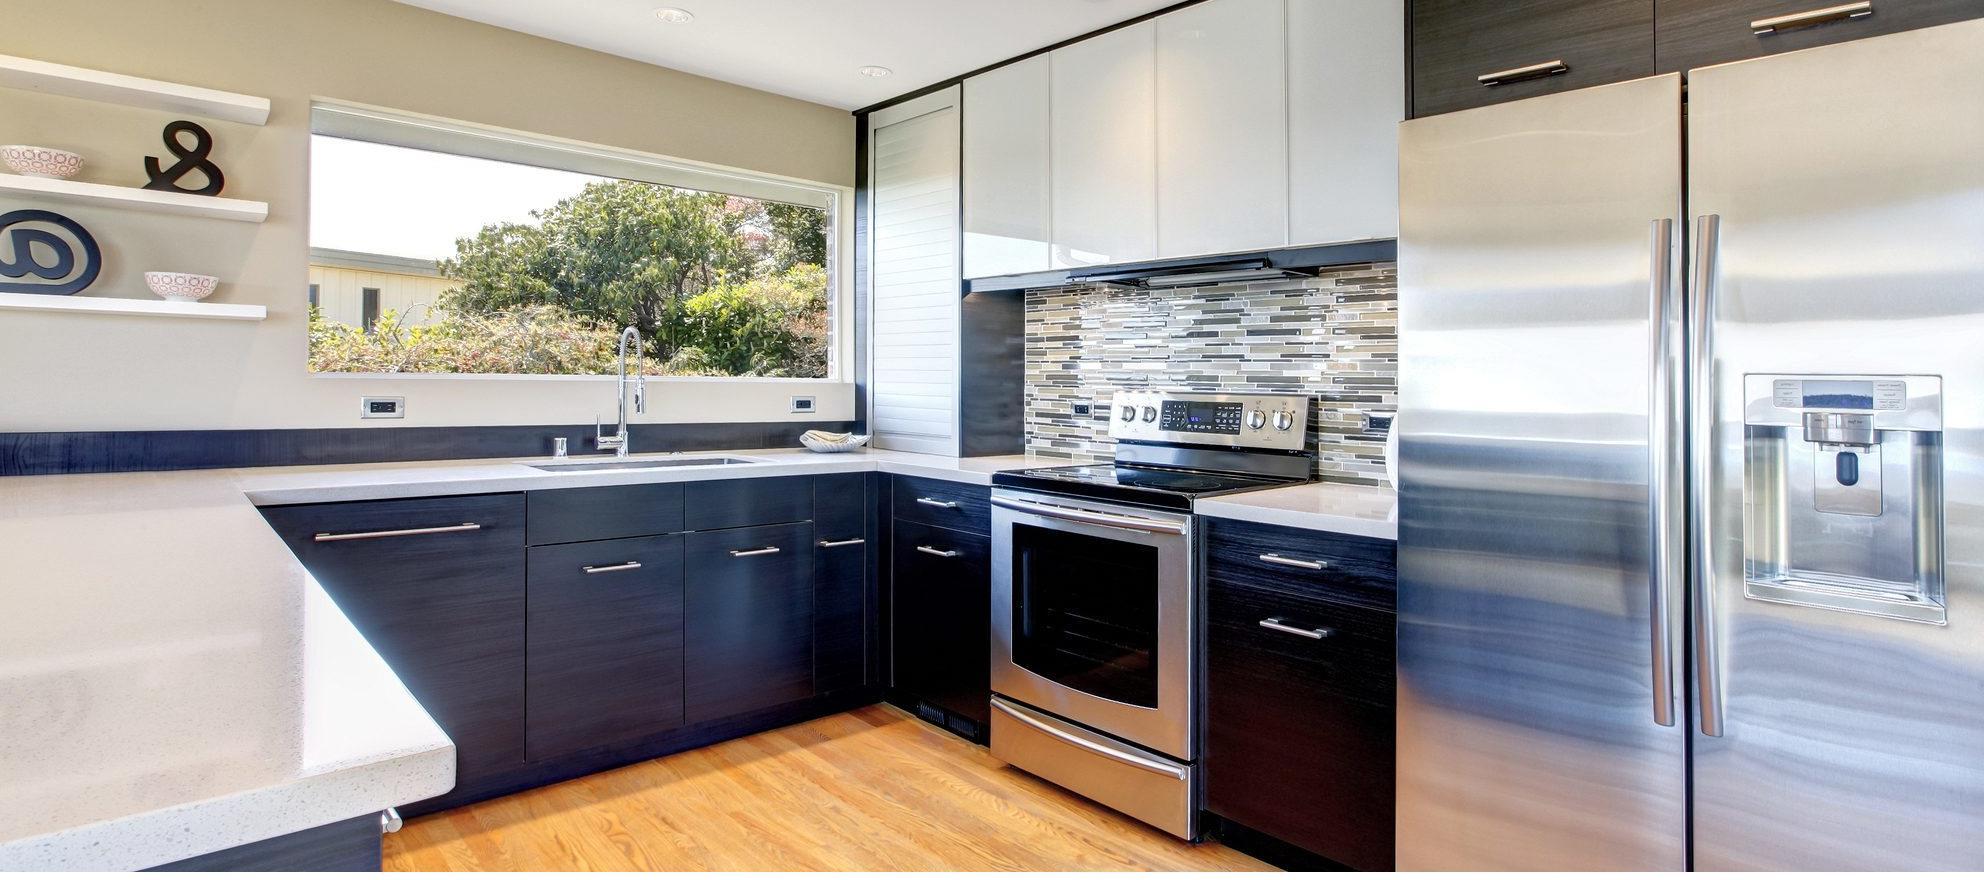 50 yeni mutfak modelleri kad n ve trend moda g zellik ve sa l k blogu. Black Bedroom Furniture Sets. Home Design Ideas